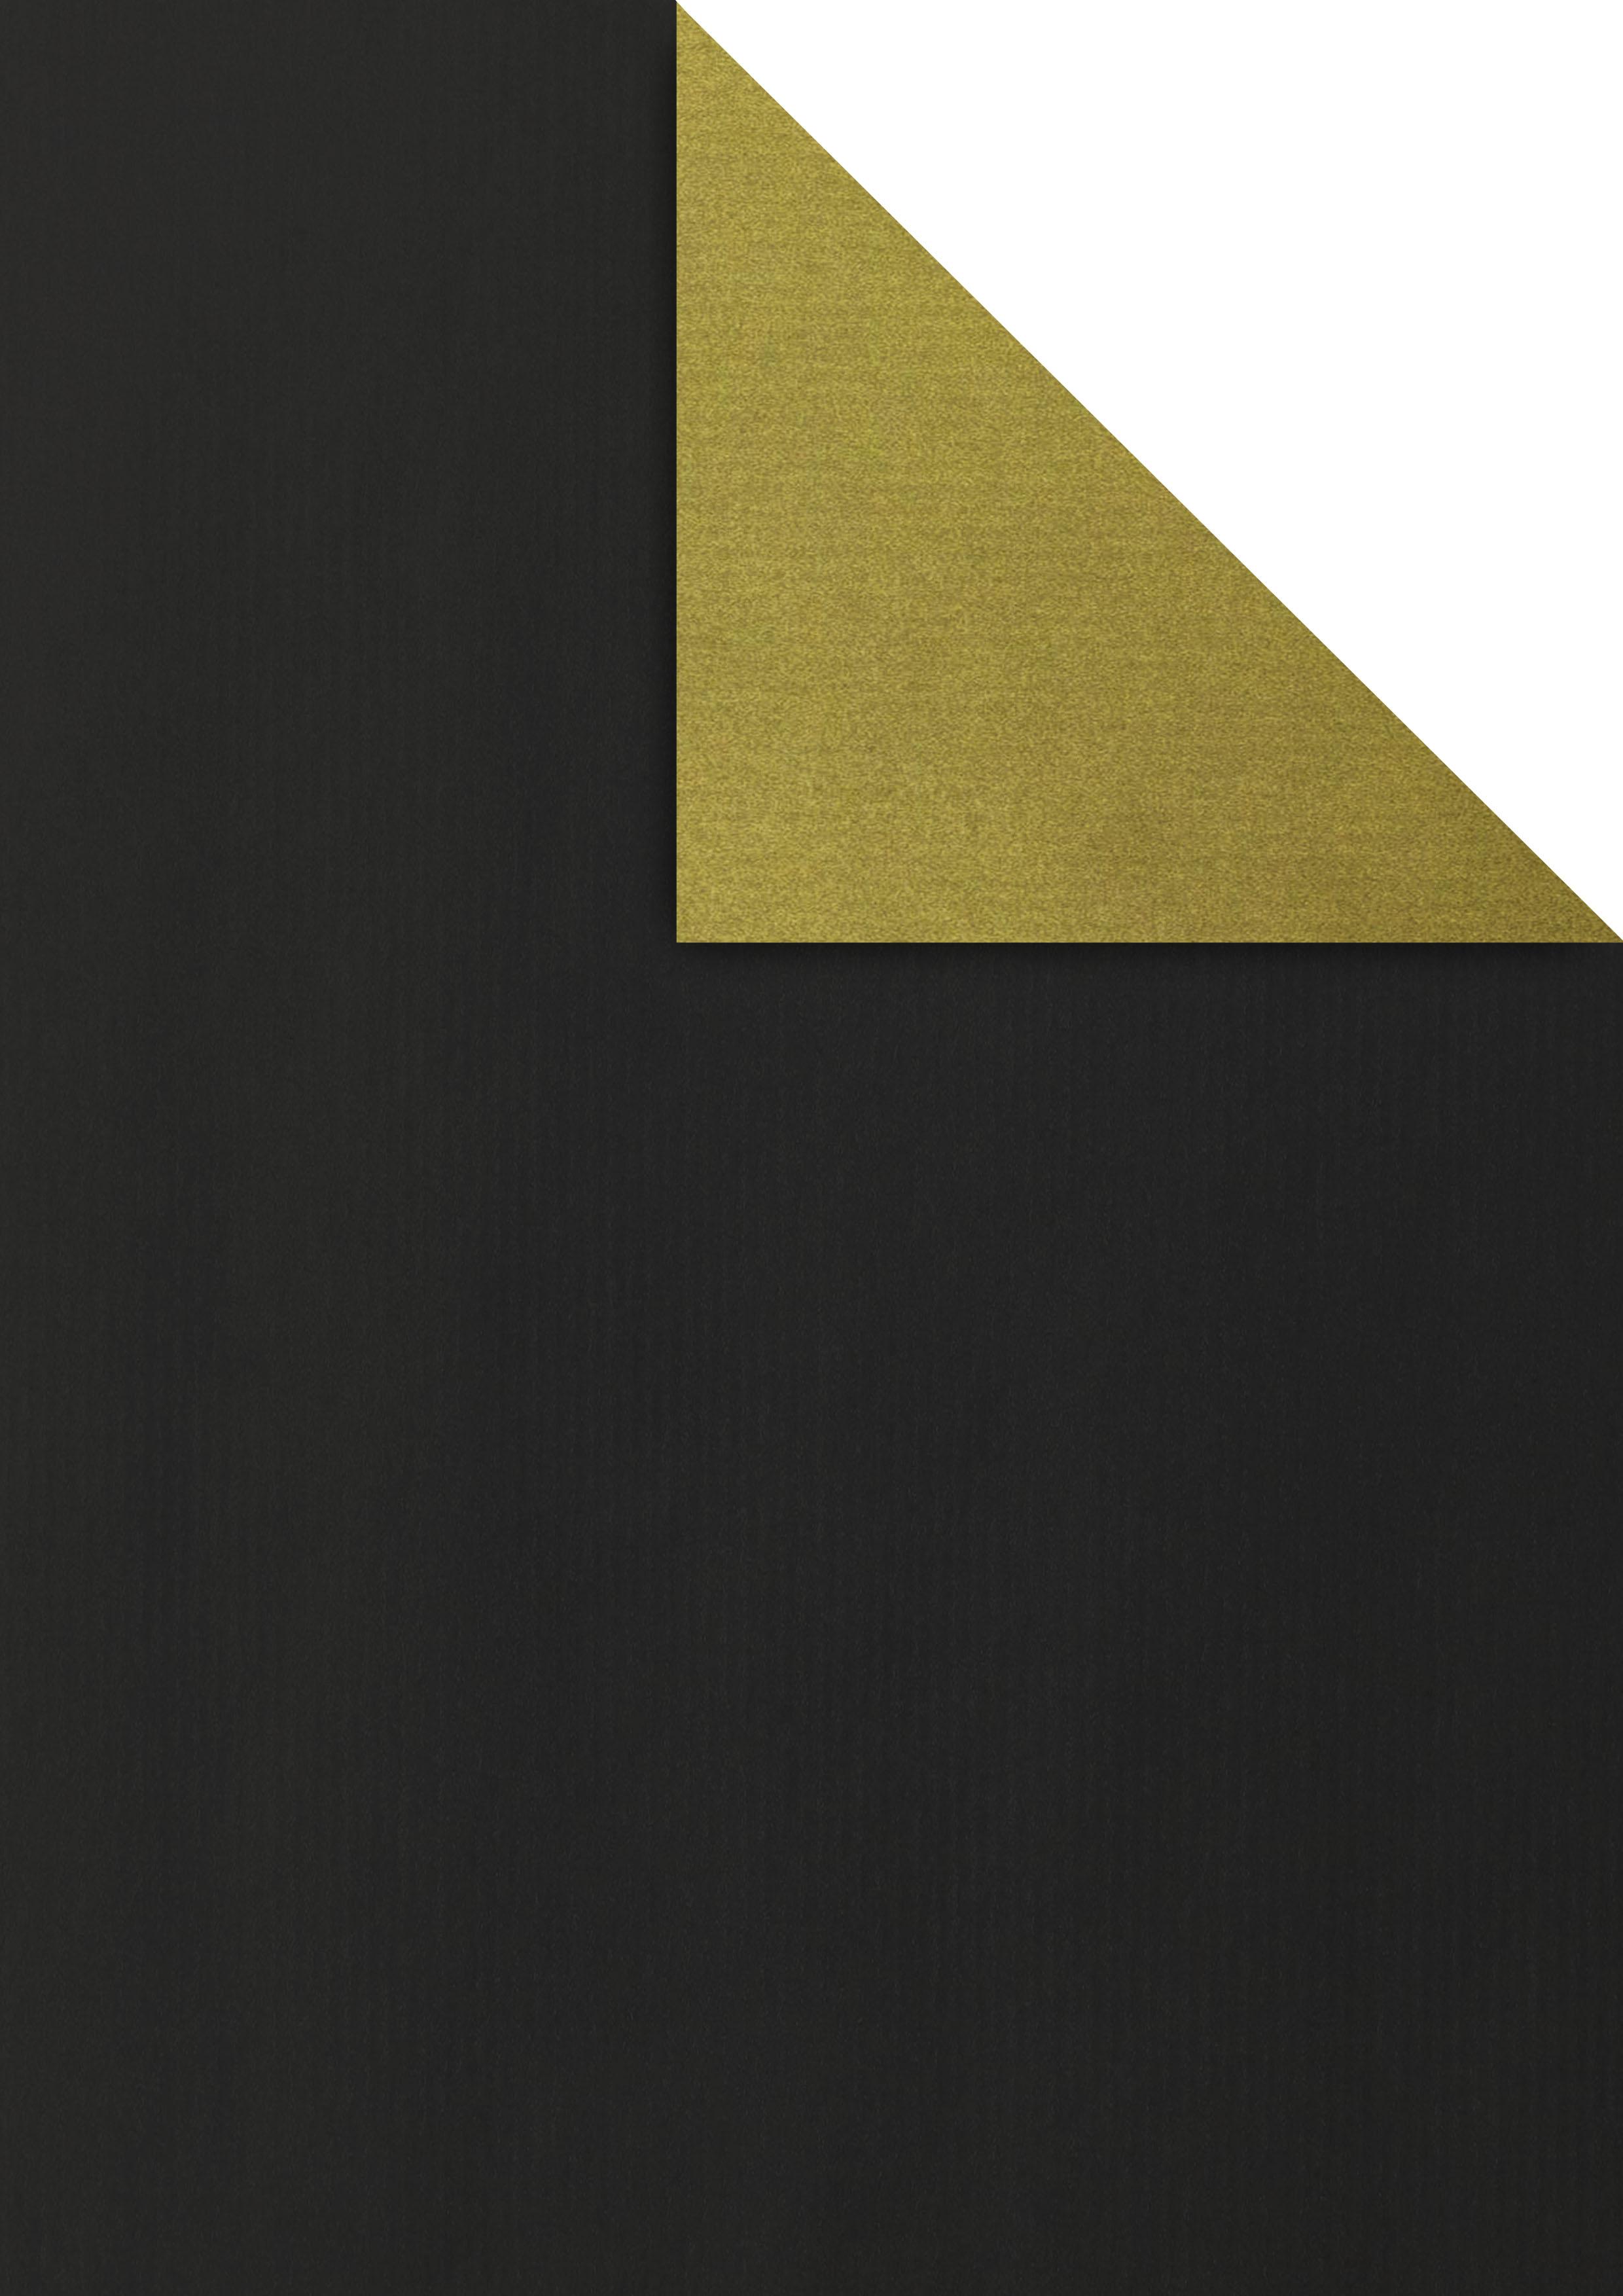 kraft marro doble cara negre or